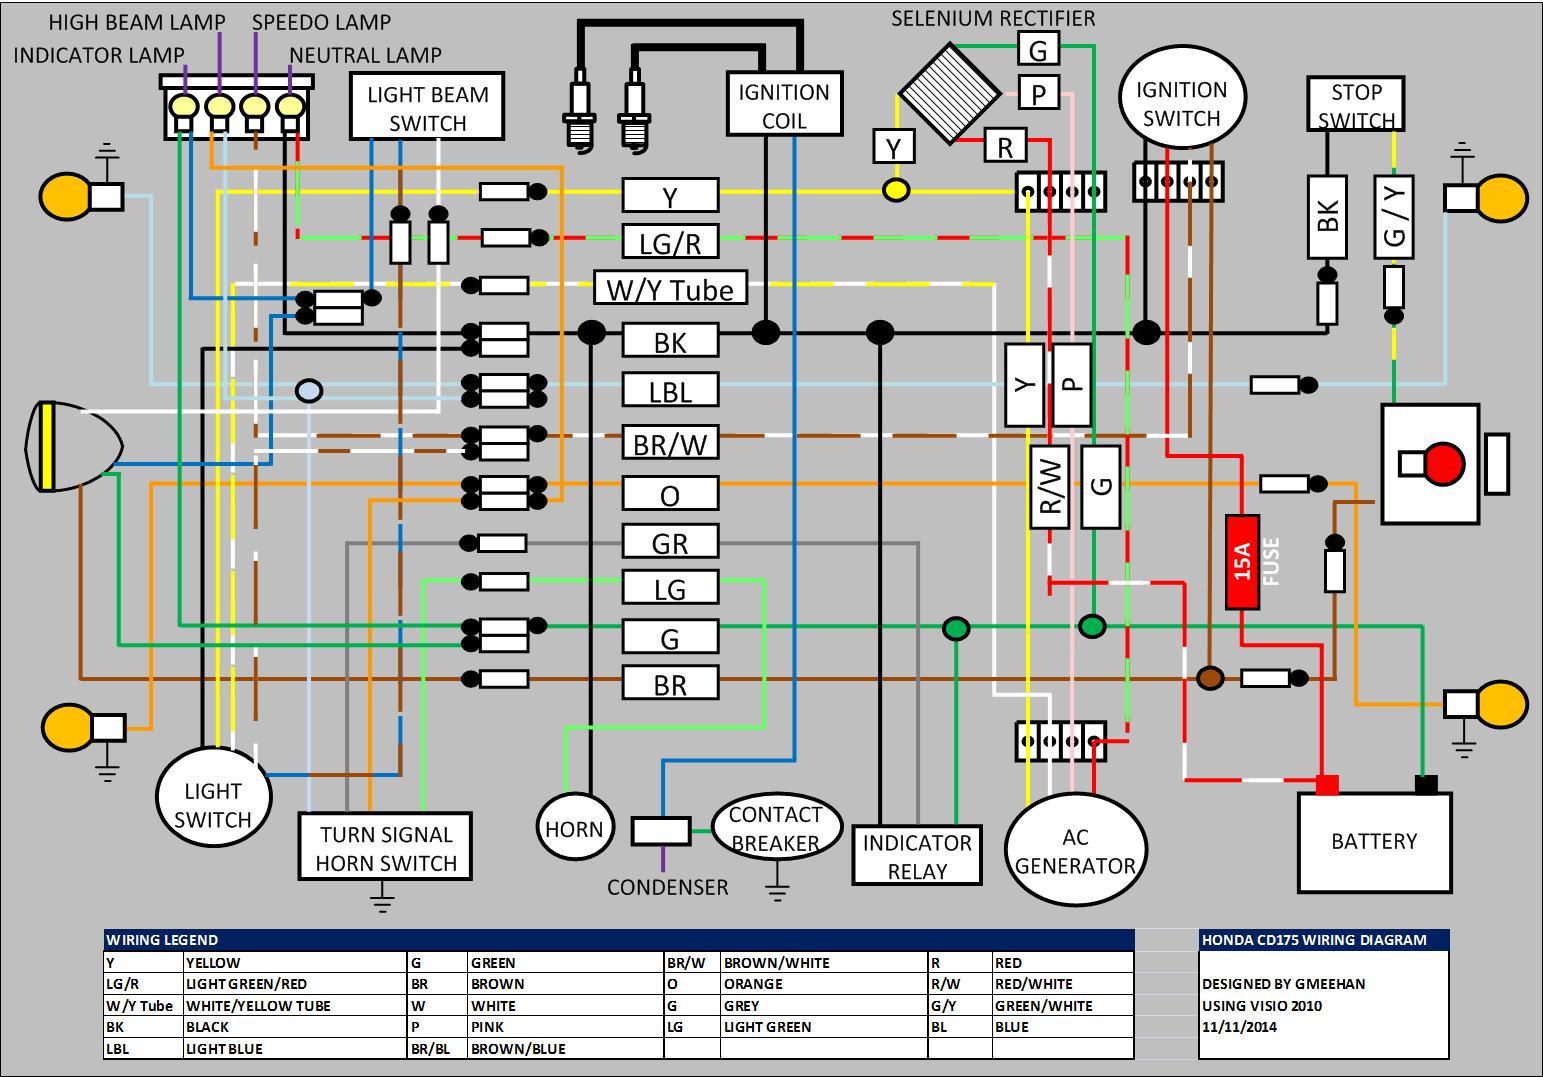 wiring diagram kick start motorcycle 125cc motorcycle wiring diagram faint repeat2 klictravel nl  125cc motorcycle wiring diagram faint